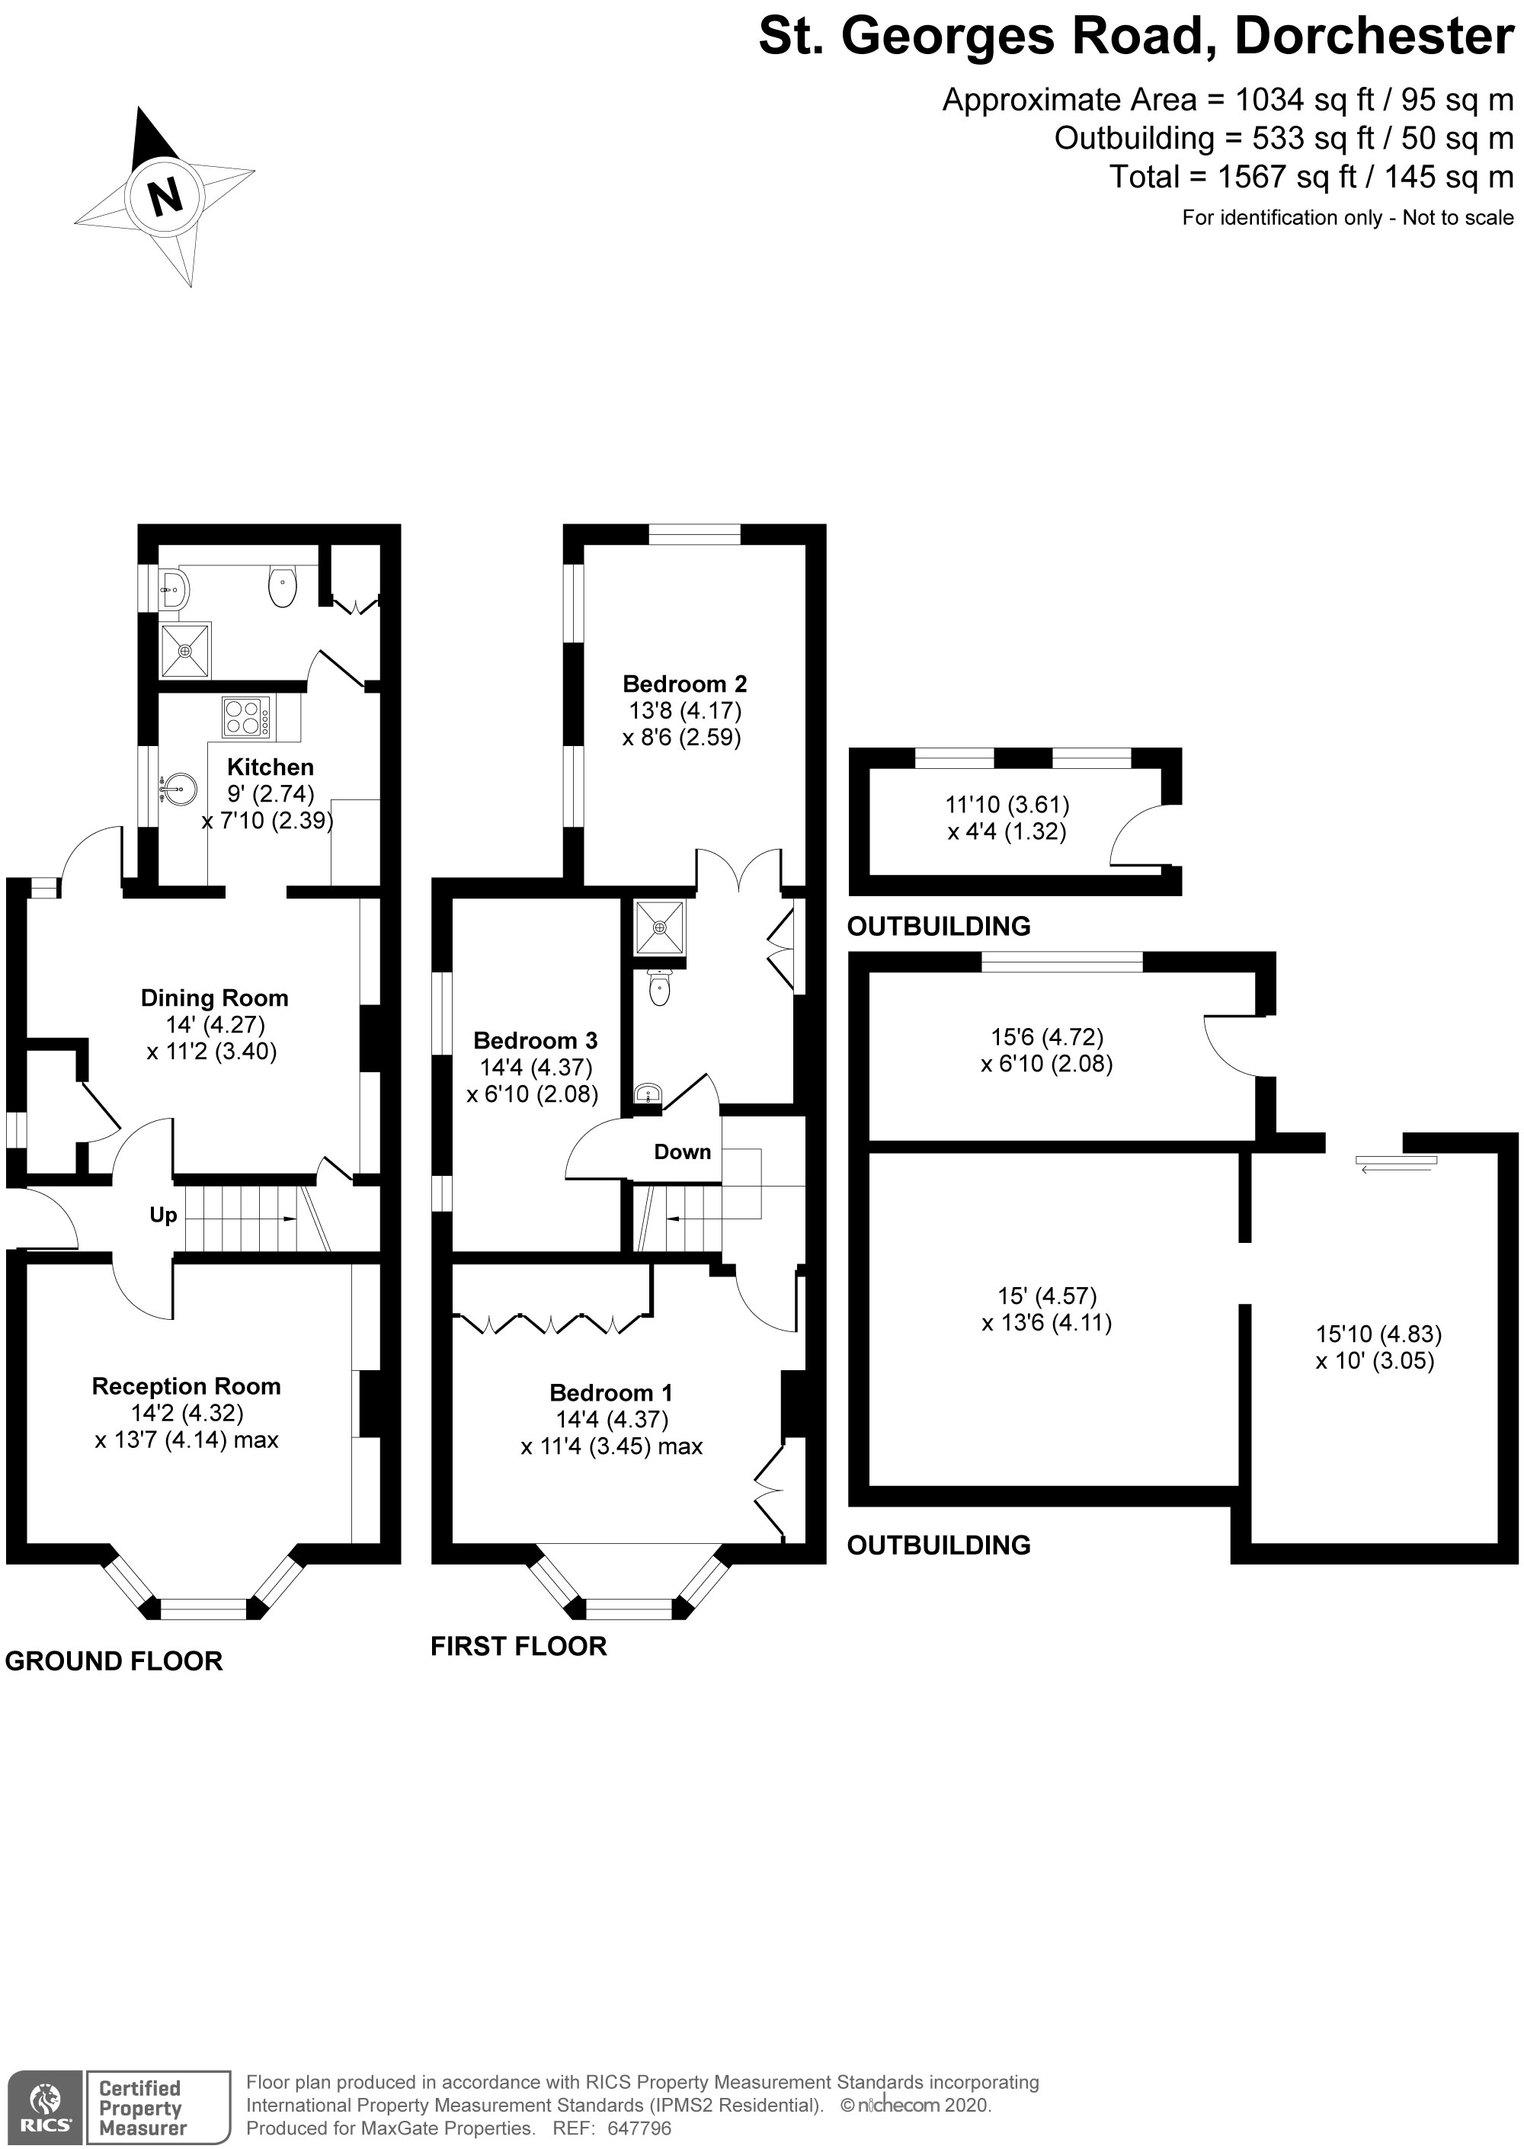 Floorplan for 13 St Georges Road, Dorchester